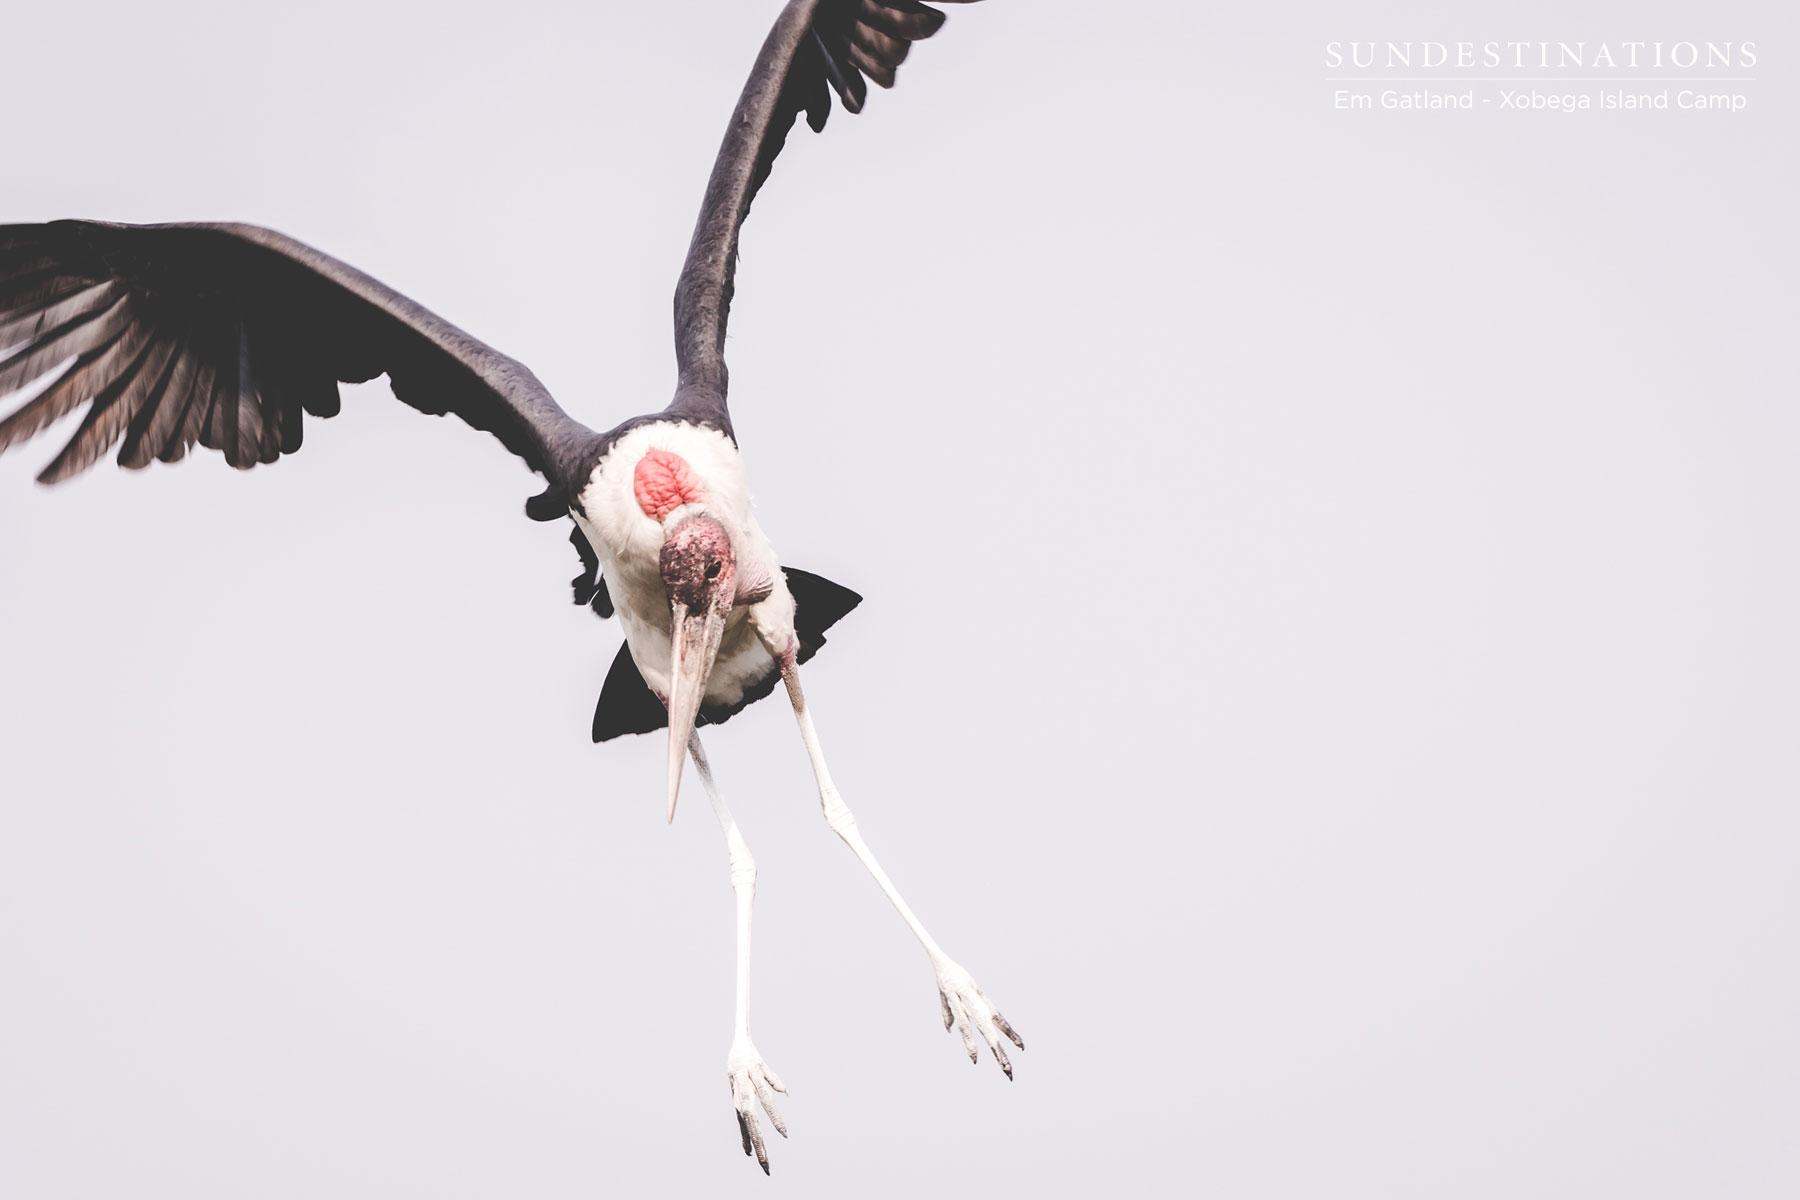 Xobega Marabou Stork